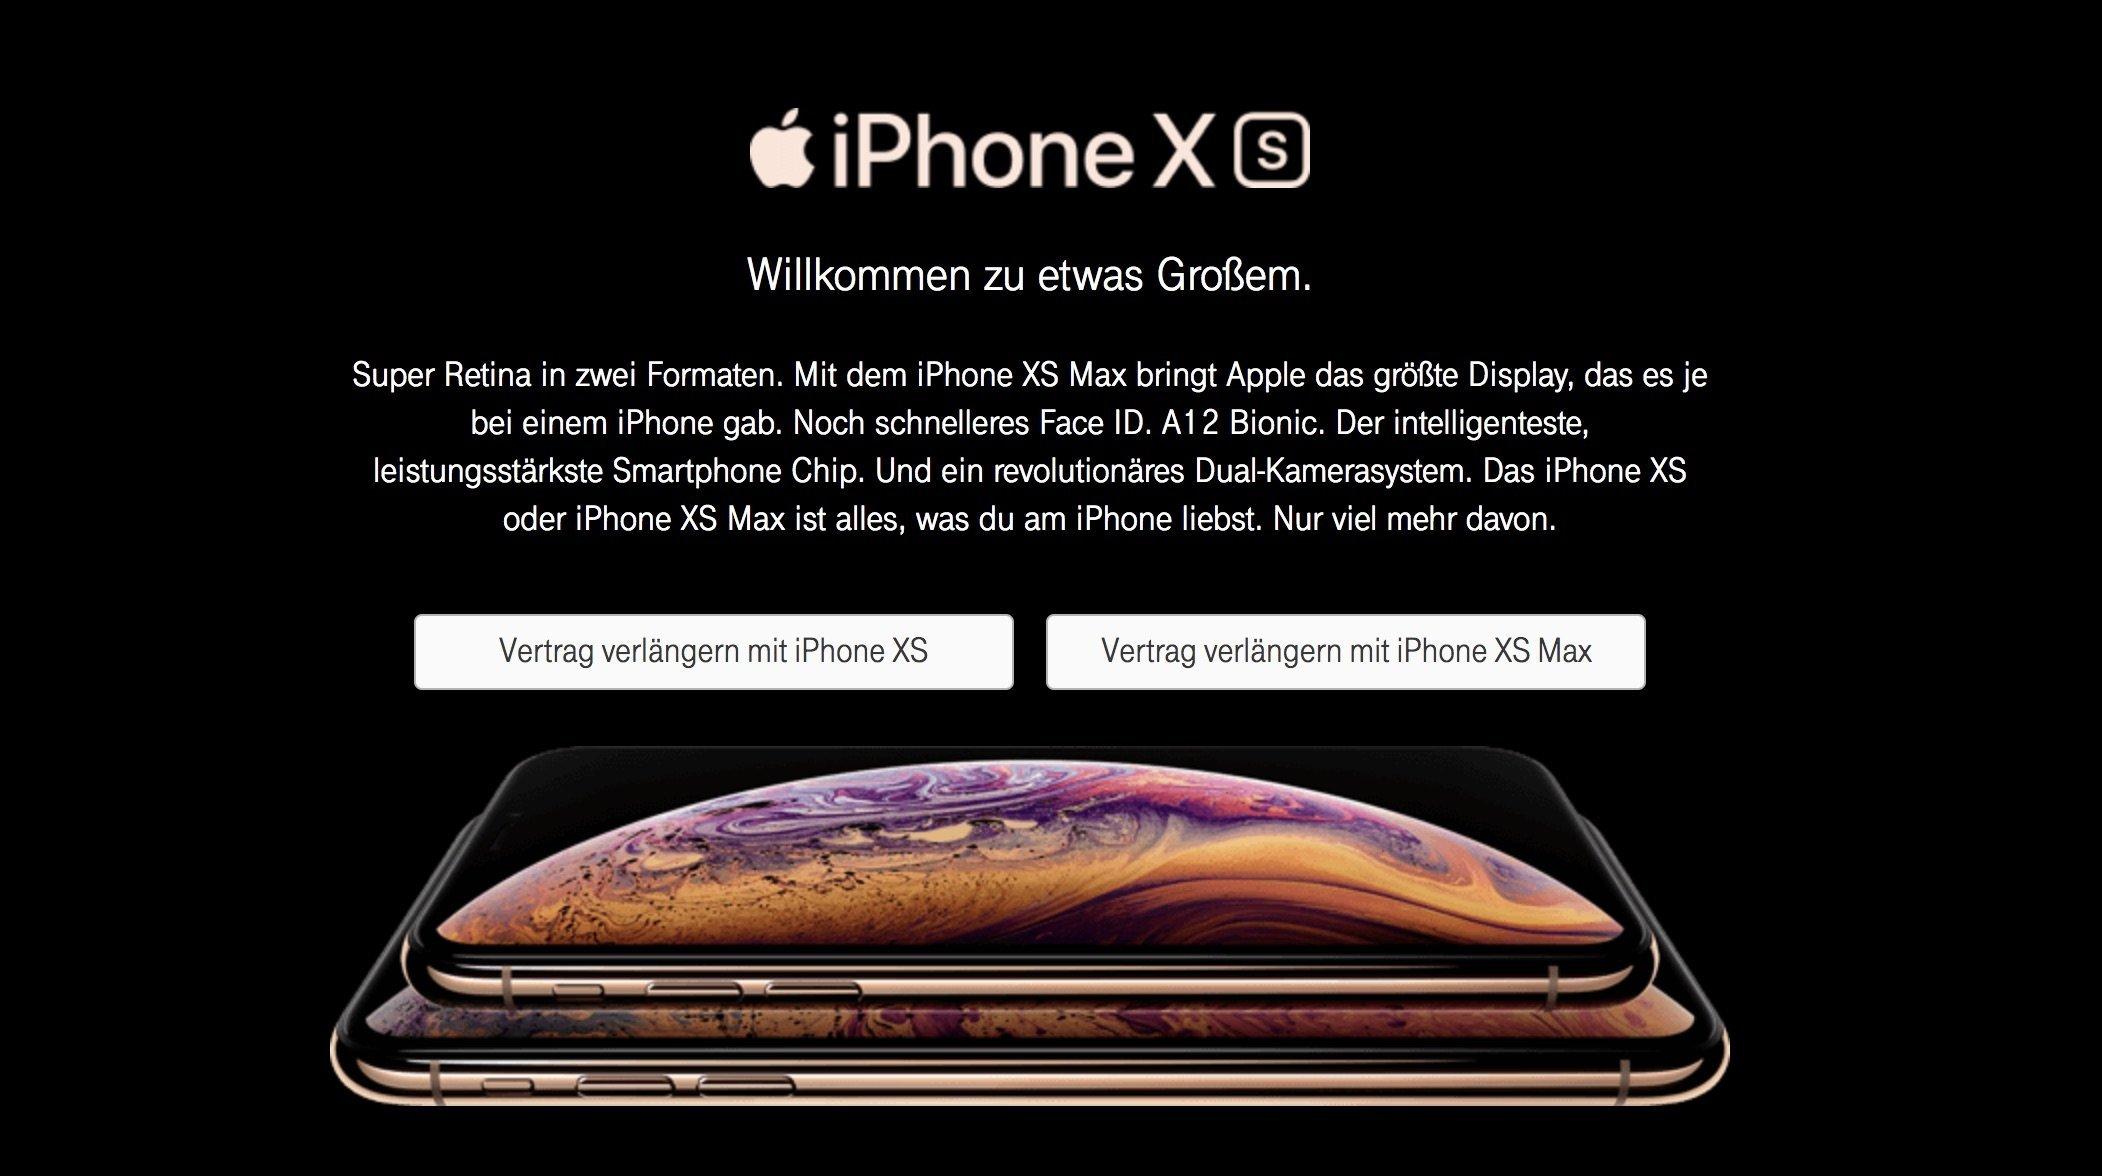 Telekom Vertragsverlängerung (VVL) mit iPhone XS (Max) 4